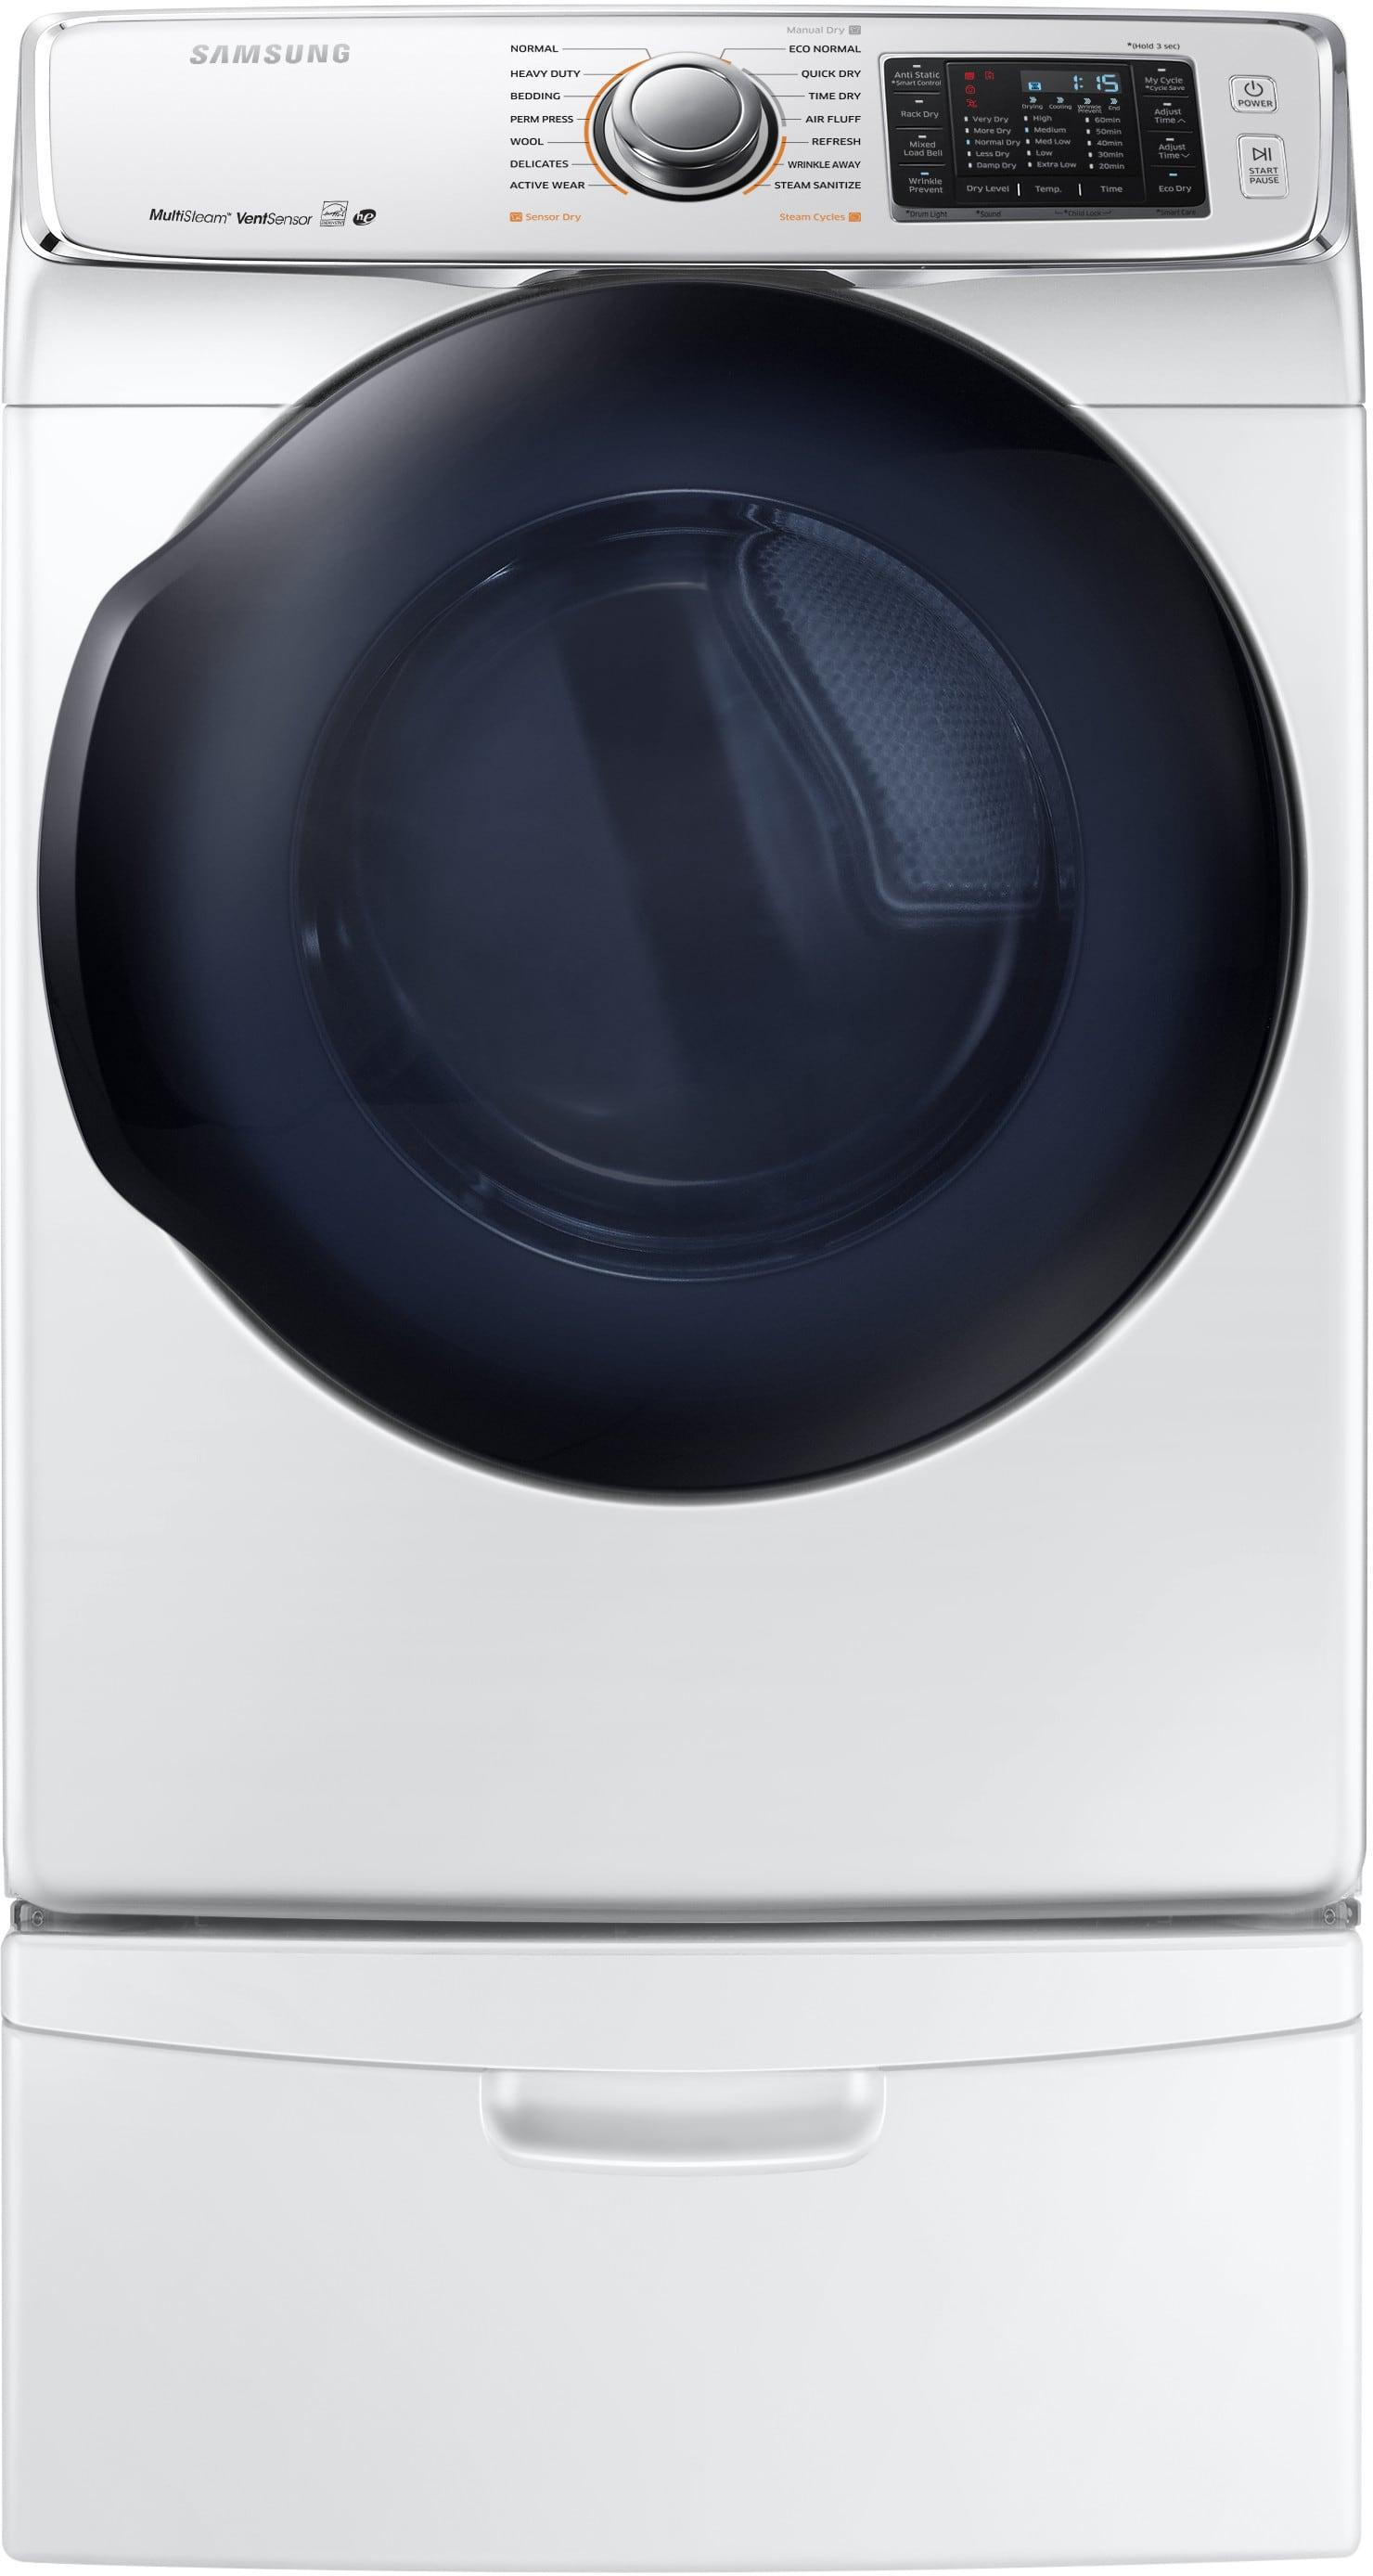 Samsung Dv50k7500ew 27 Inch 7 5 Cu Ft Electric Dryer